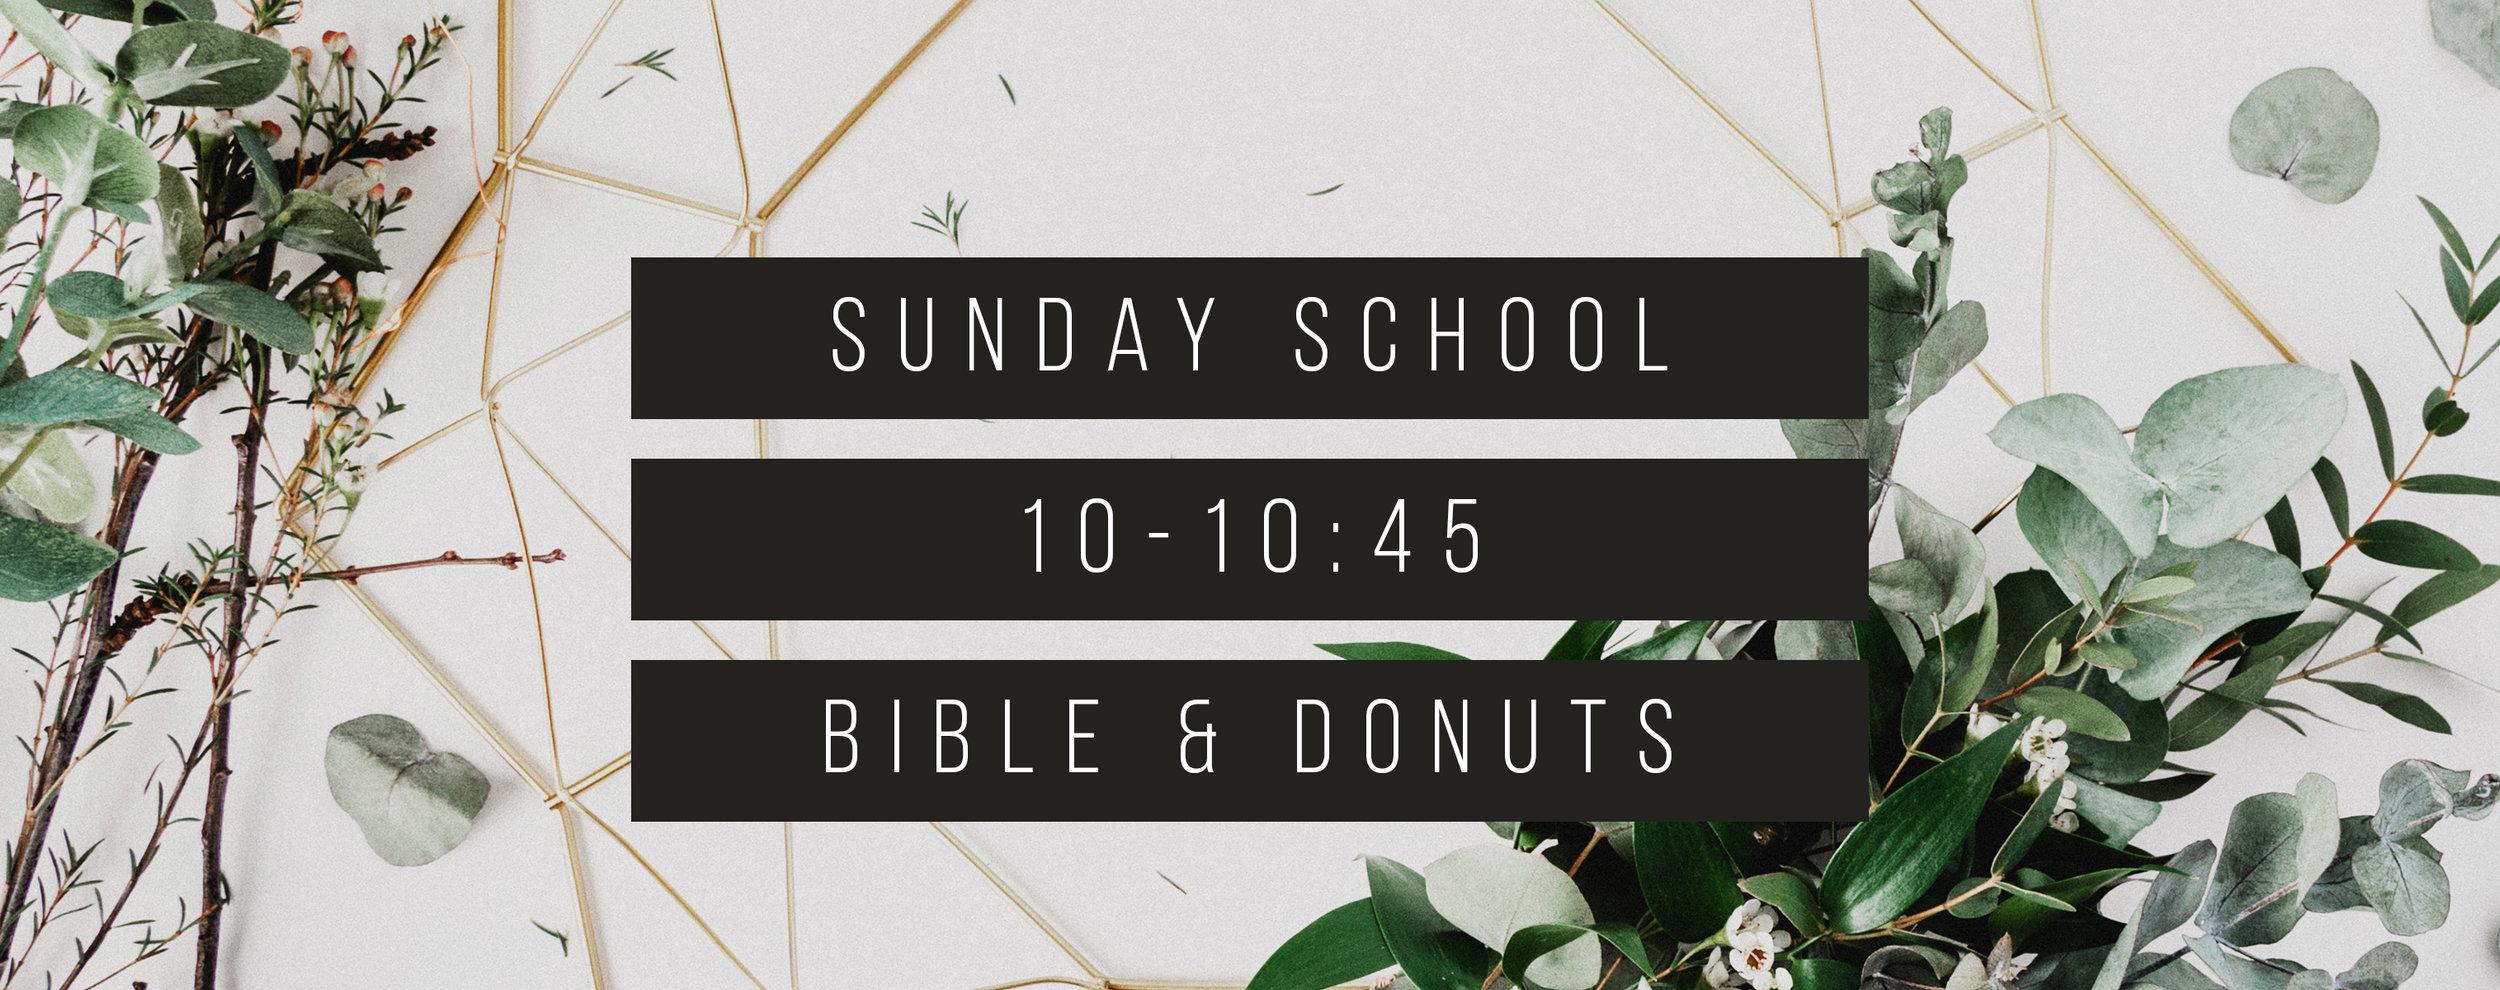 SundaySchool2017a.jpg